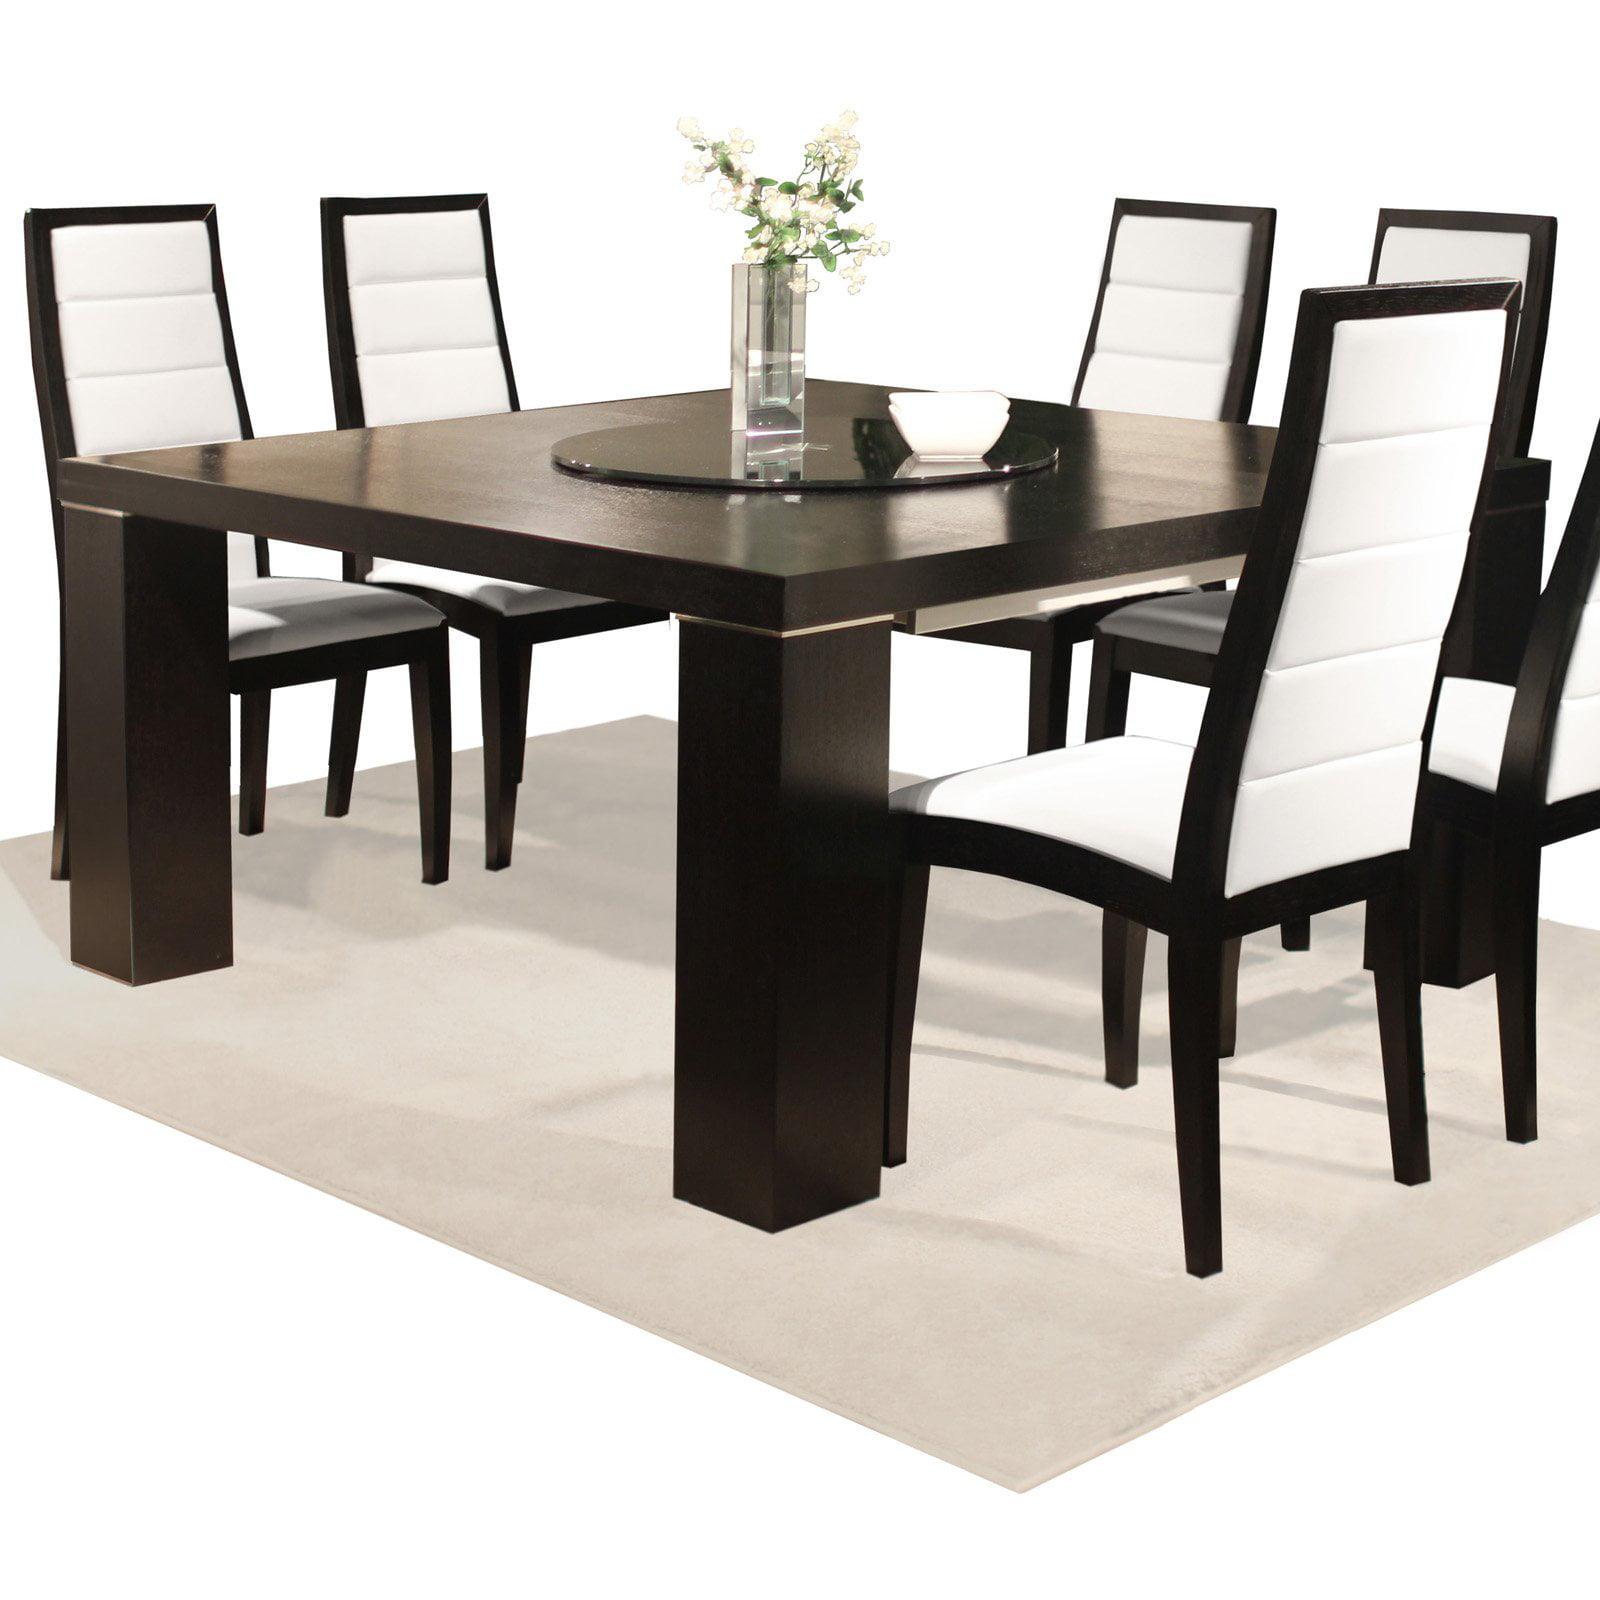 Jordan Square Extension Dining Table